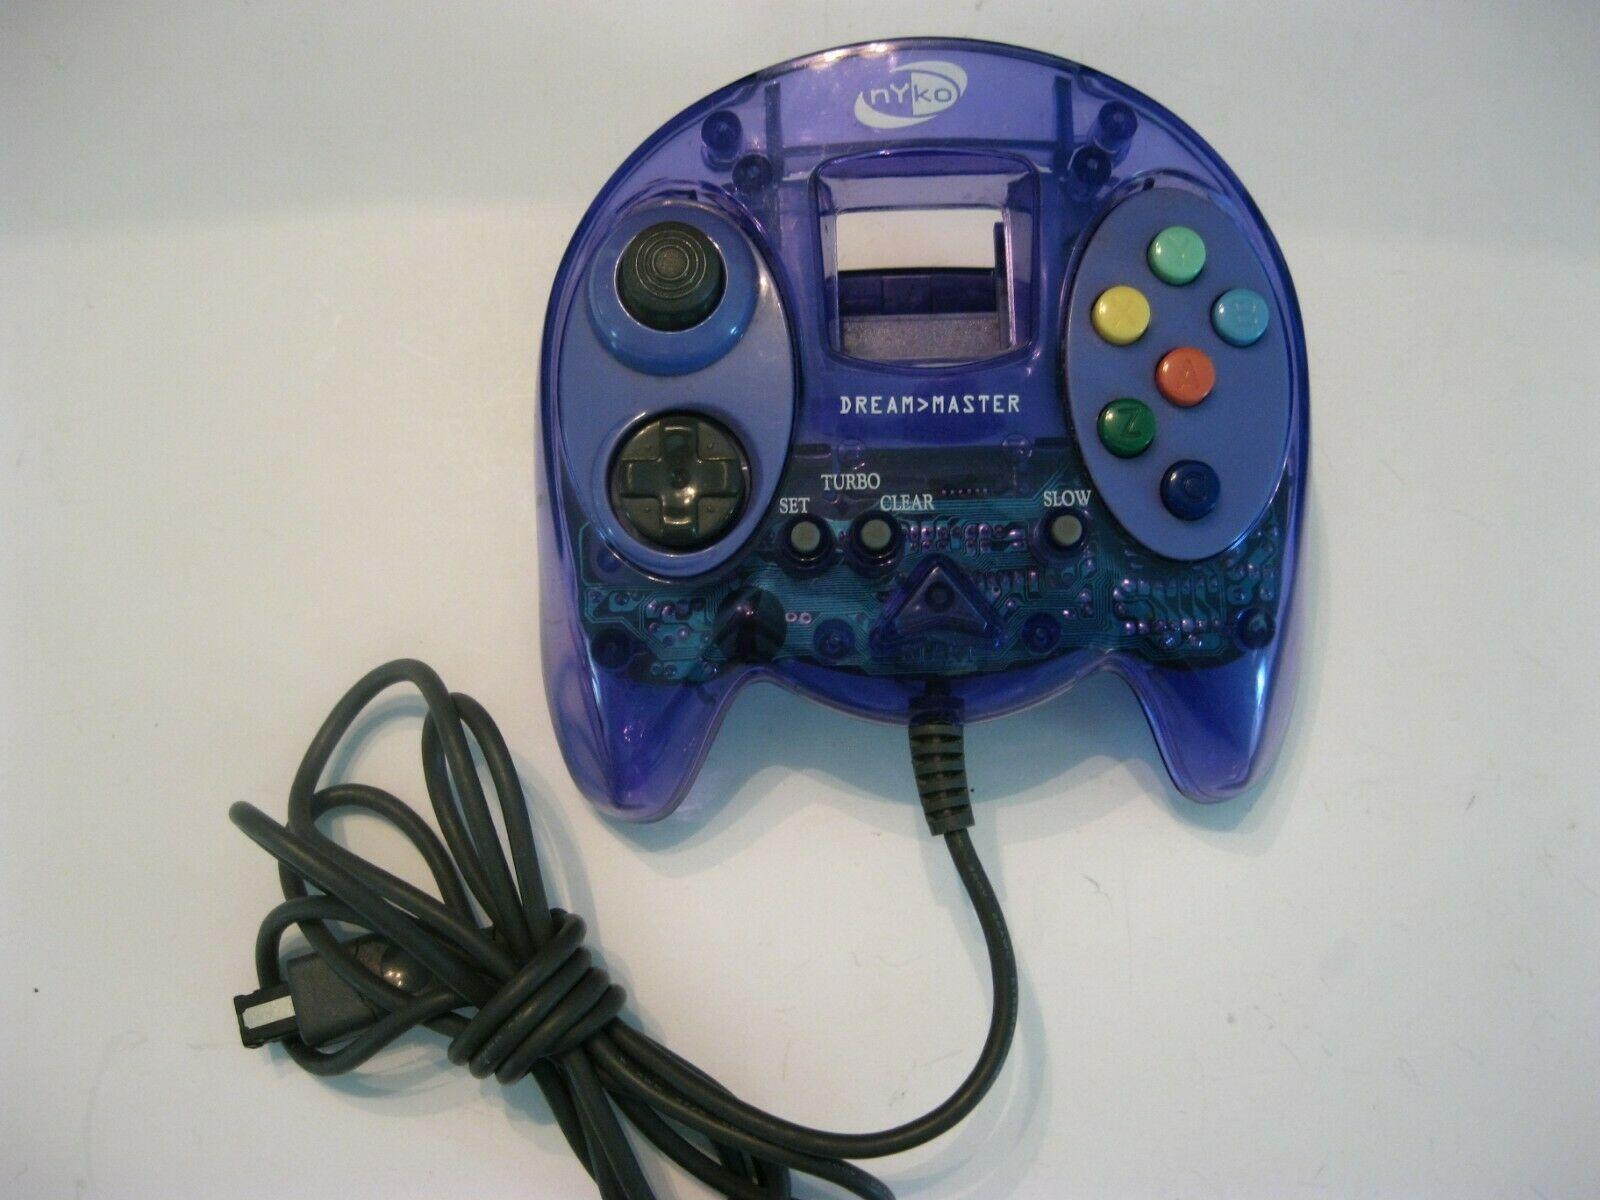 Nyko Dream Master Sega Dreamcast Controller Clear Transparent Translucent Purple